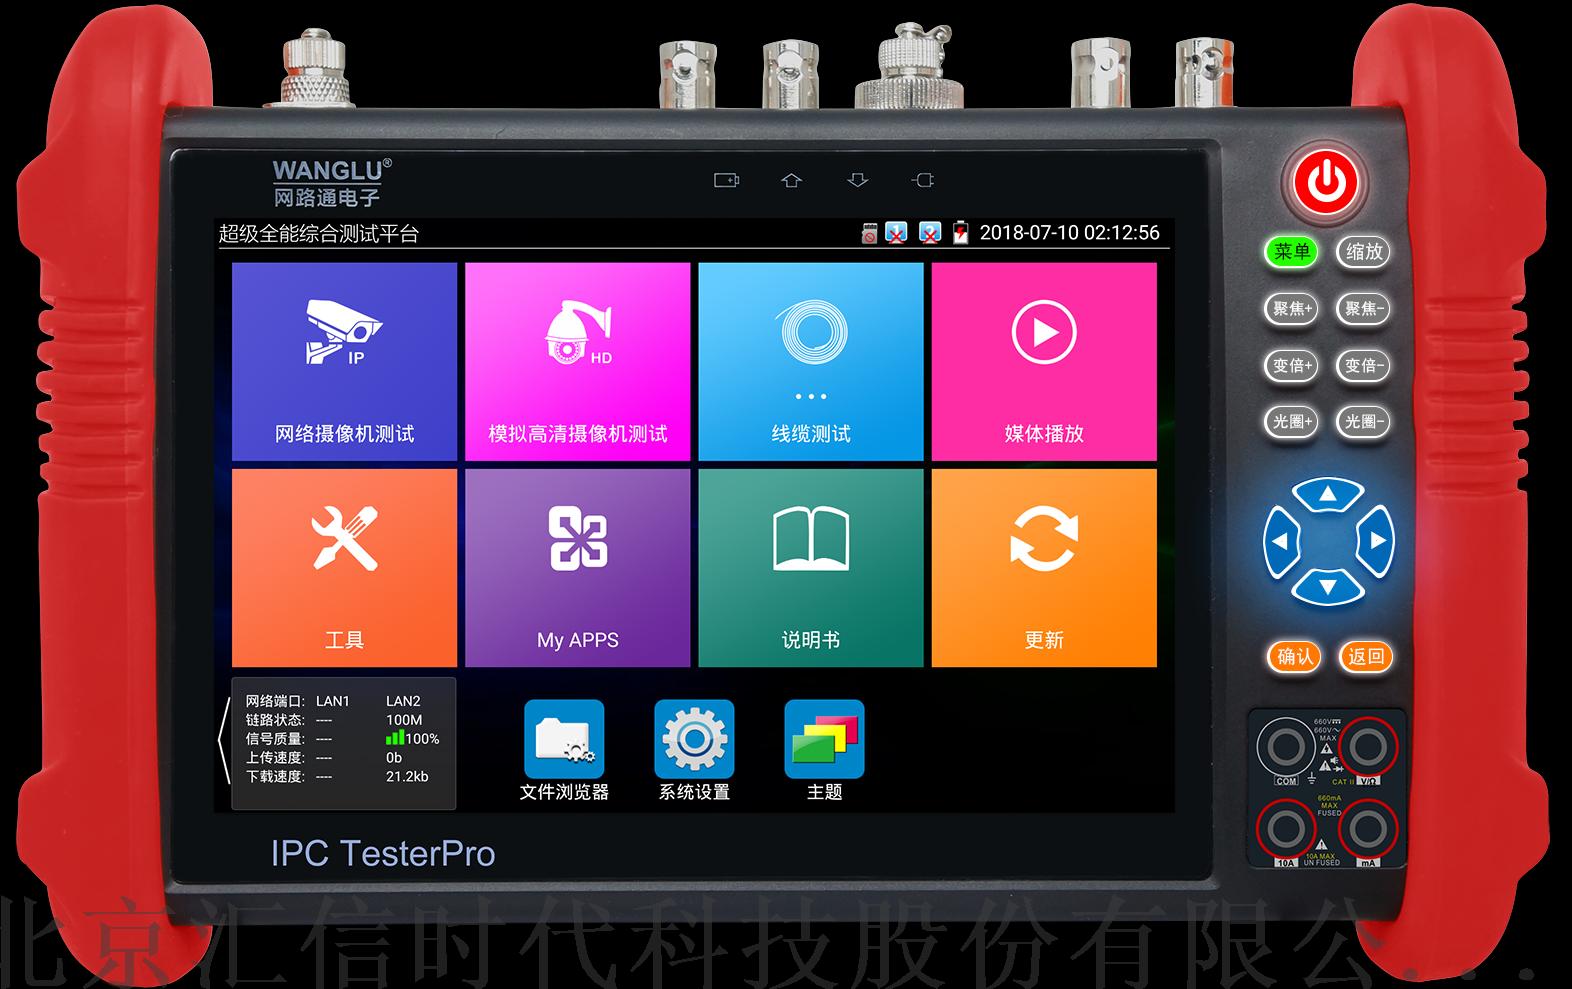 IPC-9900Plus网络视频监控综合测试仪850290465